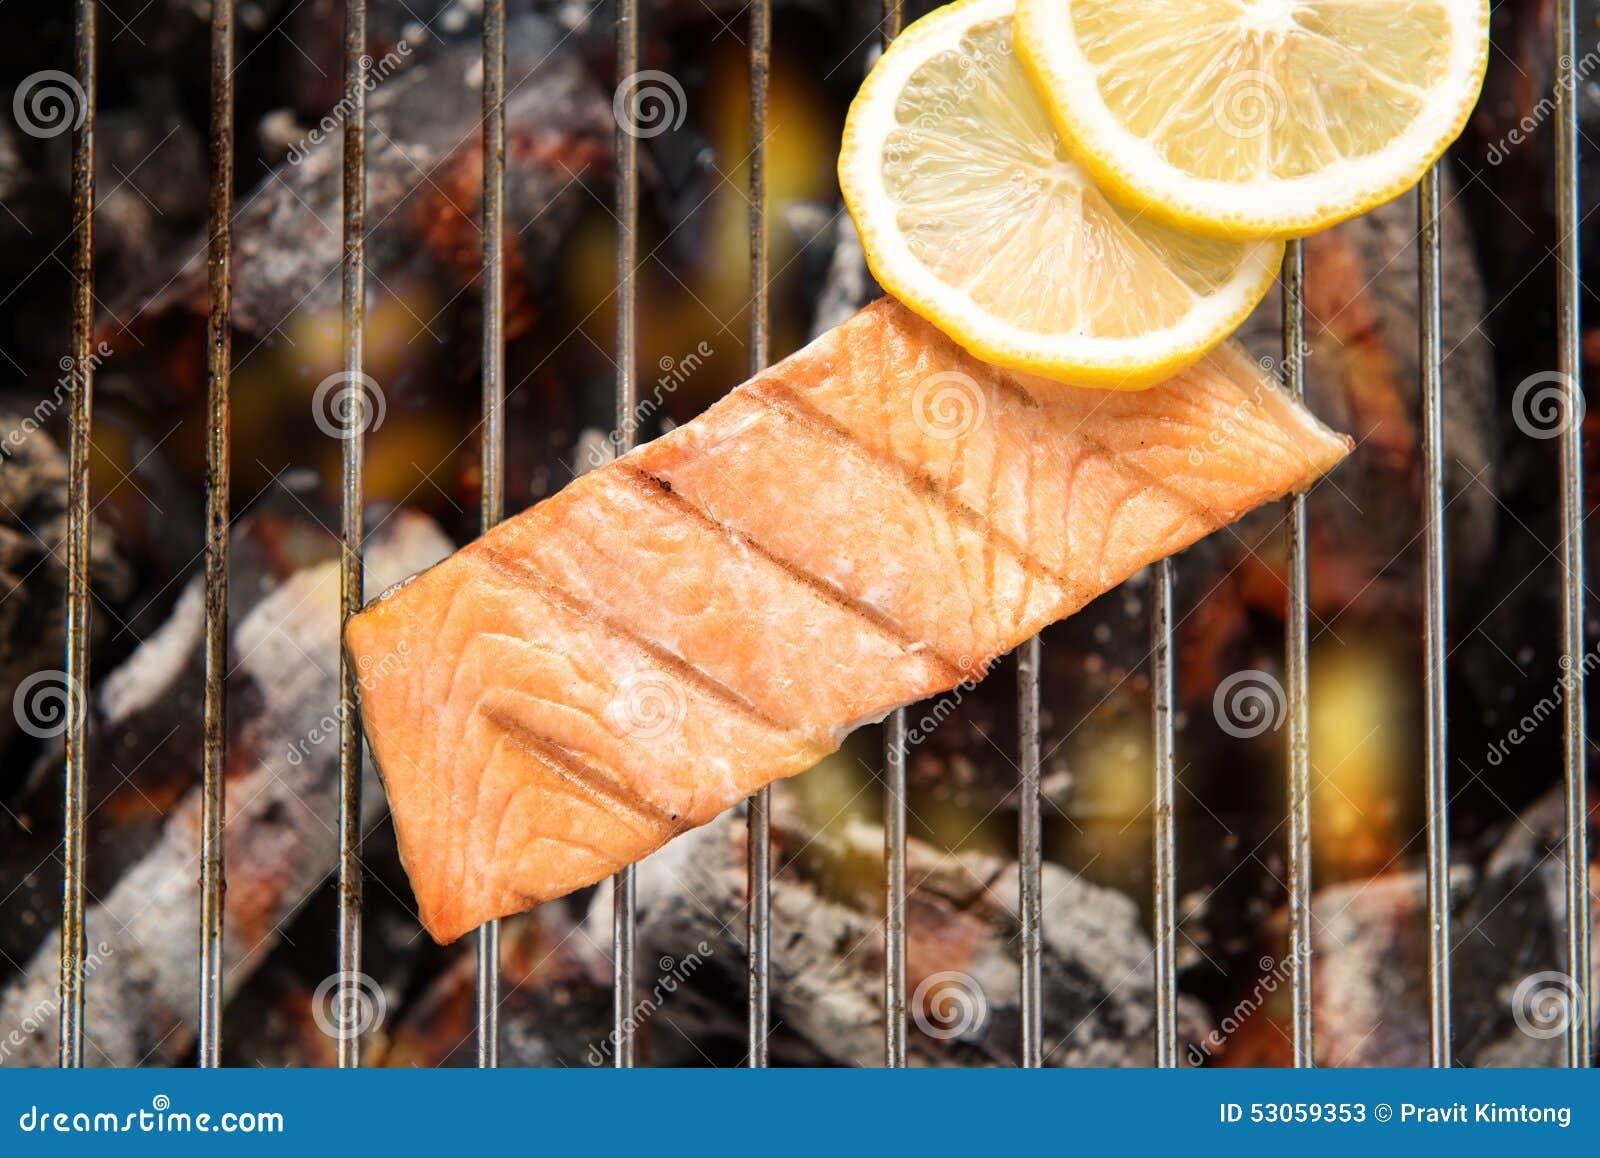 Hoogste mening geroosterde zalm met citroen op de vlammende grill